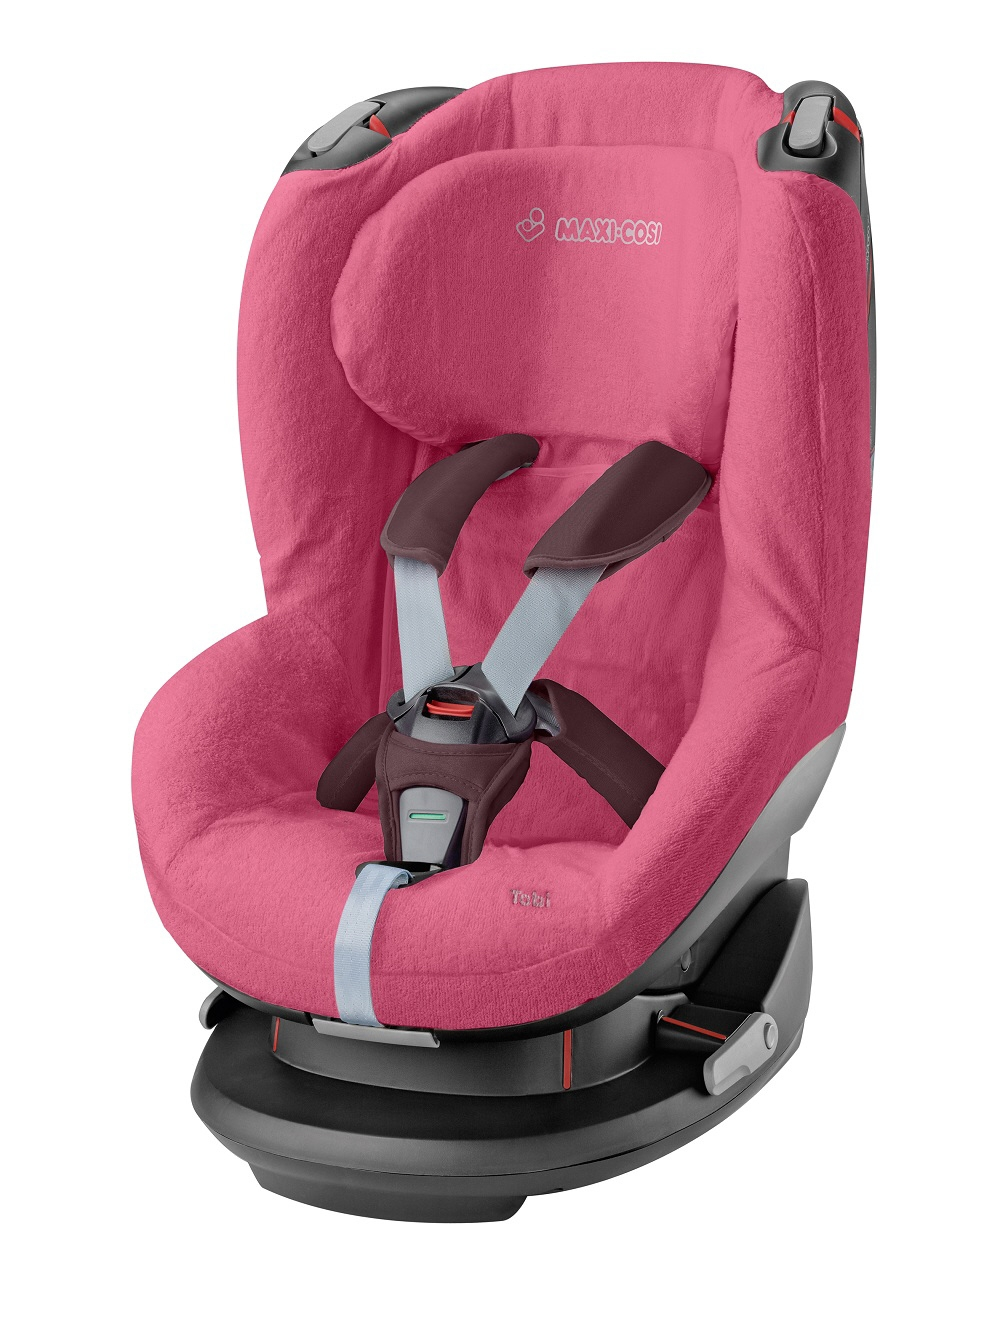 maxi cosi summer cover for child car seat tobi pink buy. Black Bedroom Furniture Sets. Home Design Ideas